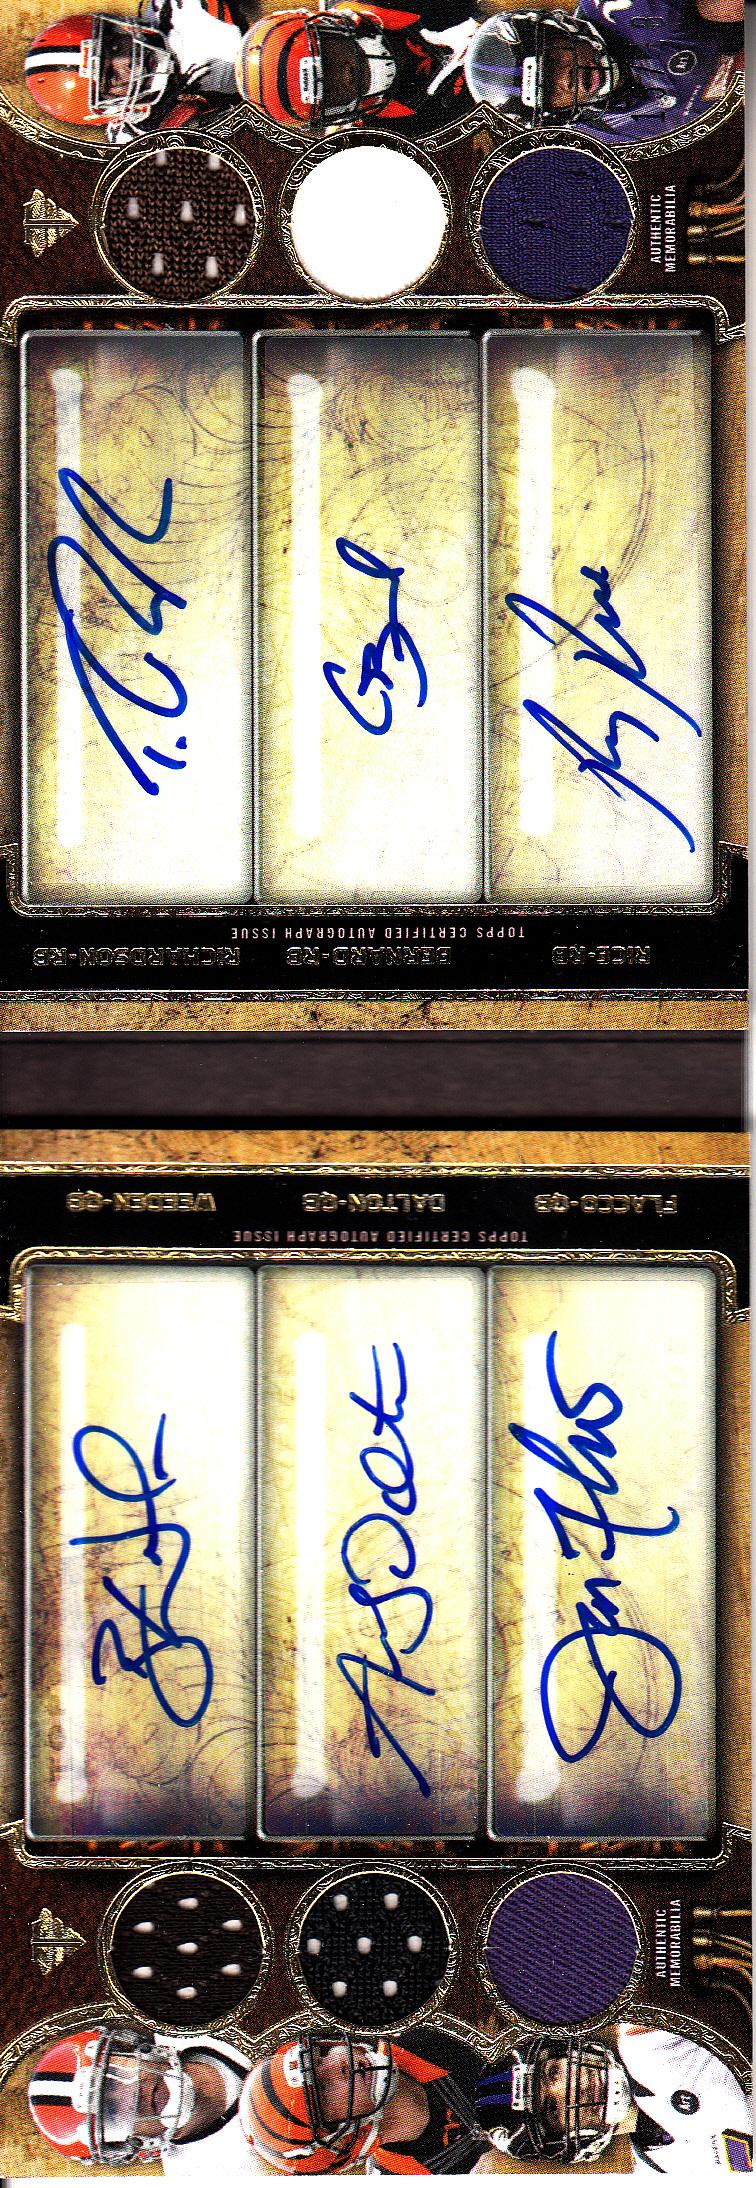 2013 Topps Triple Threads Autographed Relic Double Trios Gold #TTARDCWRDBFR Andy Dalton/Brandon Weeden/Joe Flacco/Trent Richardson/Ray Rice/Giovani Bernard